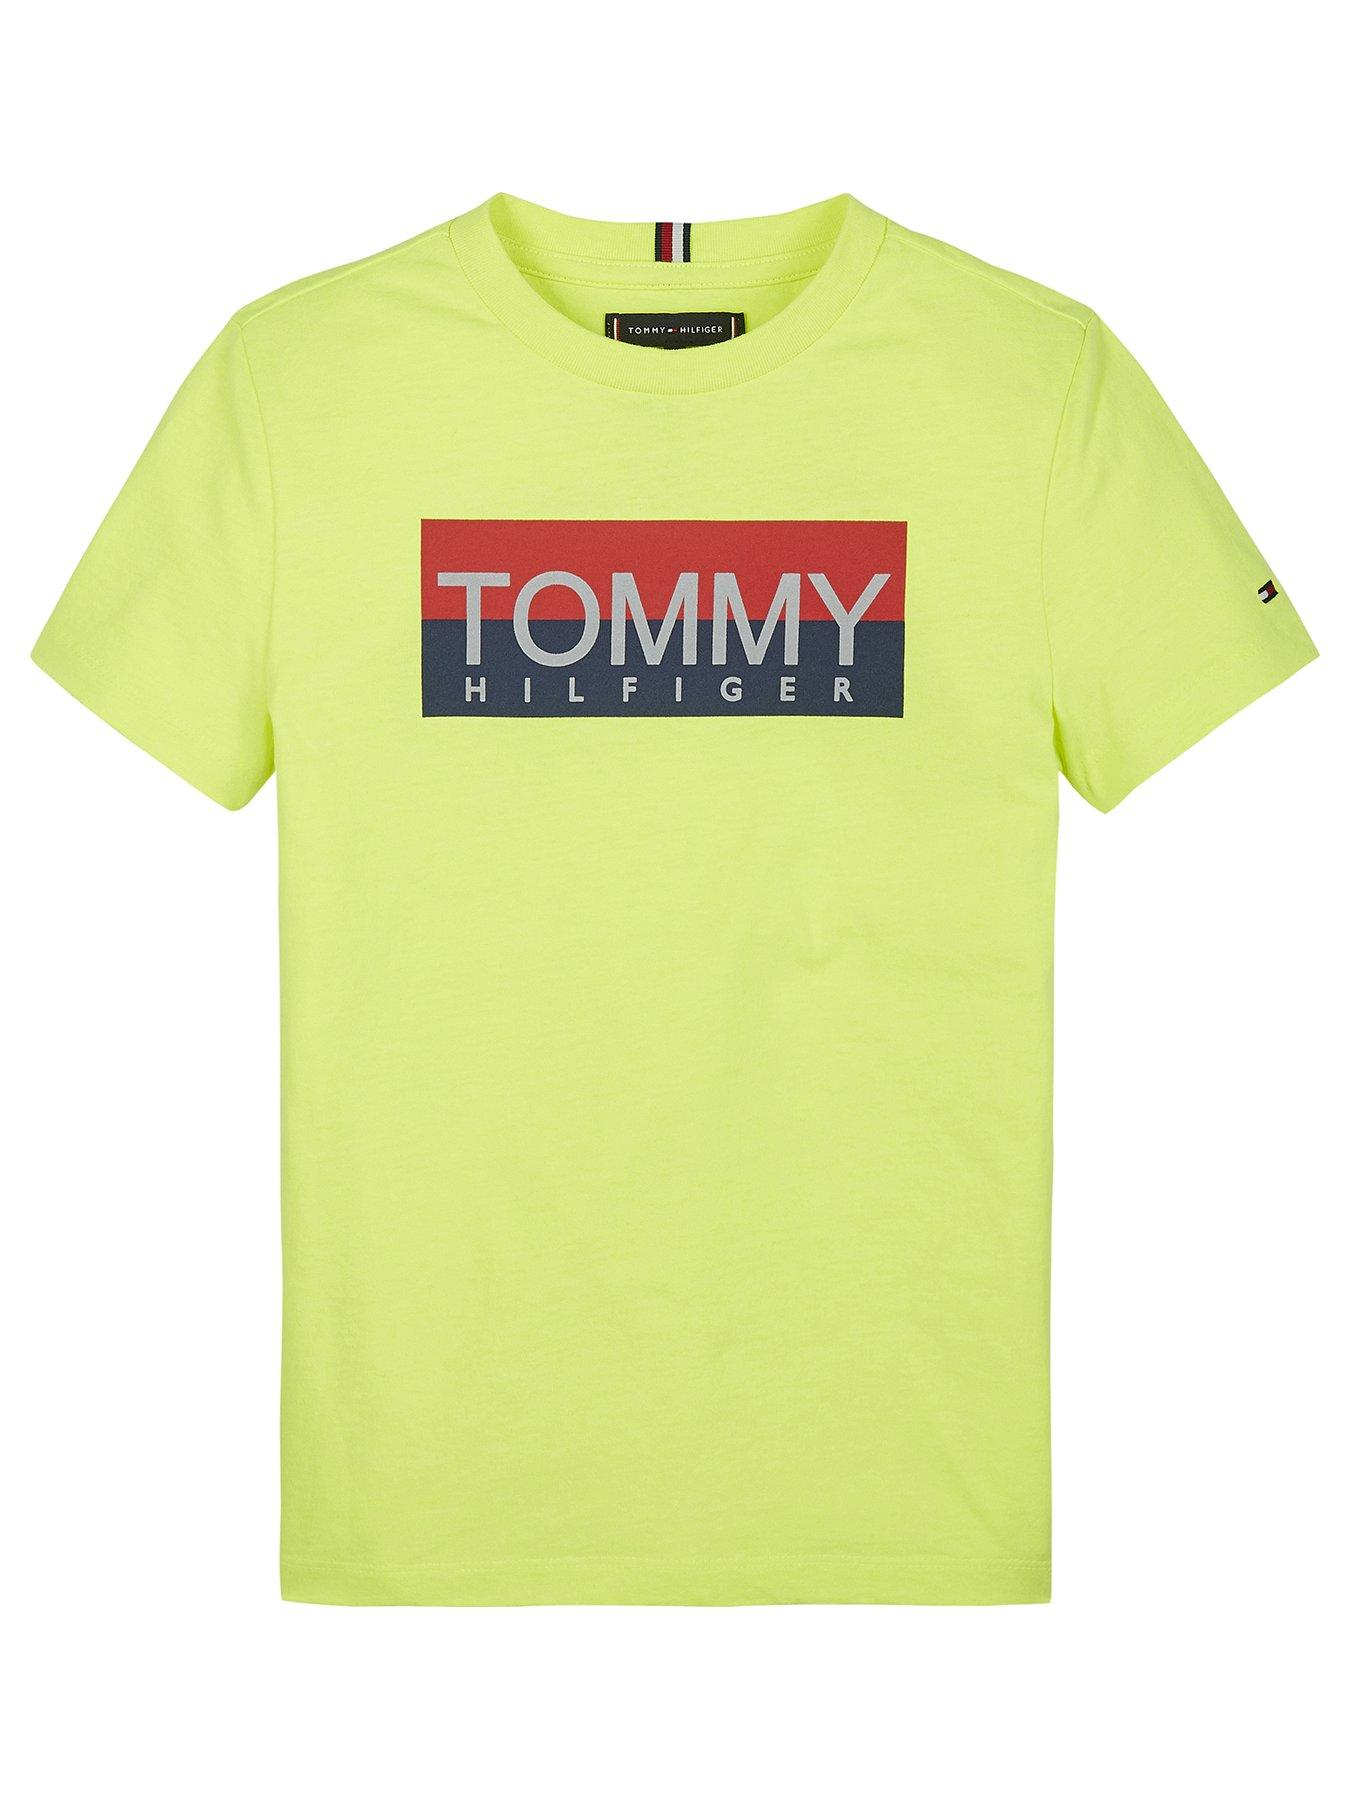 Thin Red Line Flag Unisex Youths Short Sleeve T-Shirt Kids T-Shirt Tops Black